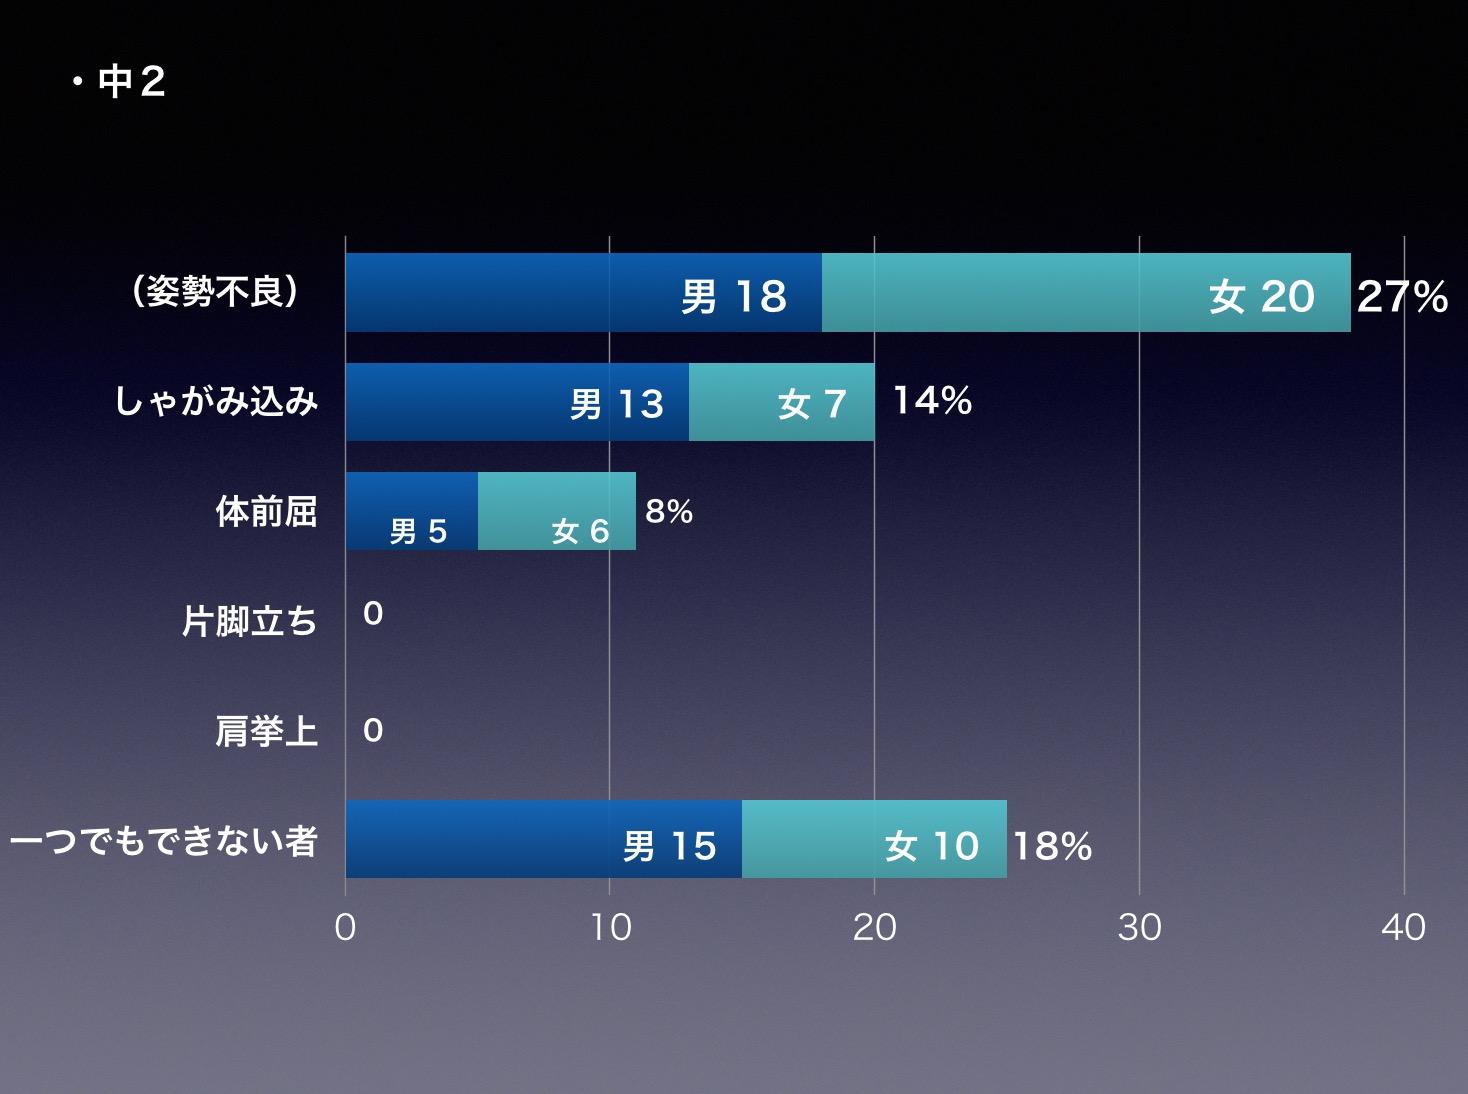 %e3%82%b9%e3%82%af%e3%83%aa%e3%83%bc%e3%83%b3%e3%82%b7%e3%83%a7%e3%83%83%e3%83%88-2016-09-08-6-10-07